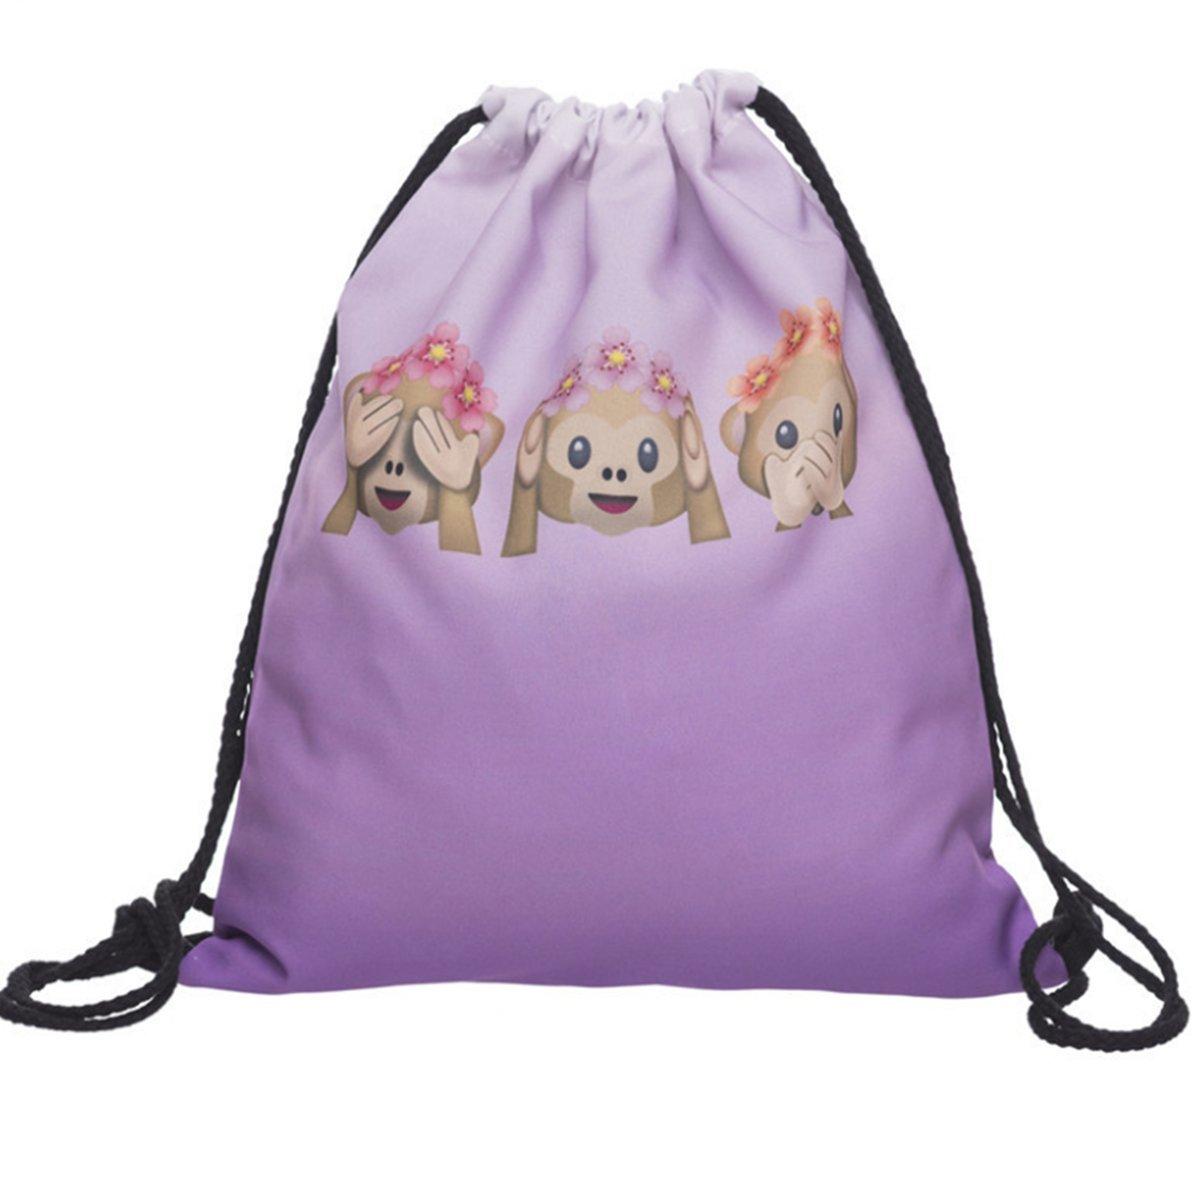 Winzikユニセックス巾着バッグ3d印刷絵文字パターン軽量ジムトレーニングSackpack旅行バックパックアウトドアスポーツバッグショッピングカジュアルデイパック B071D4BH1B  9#